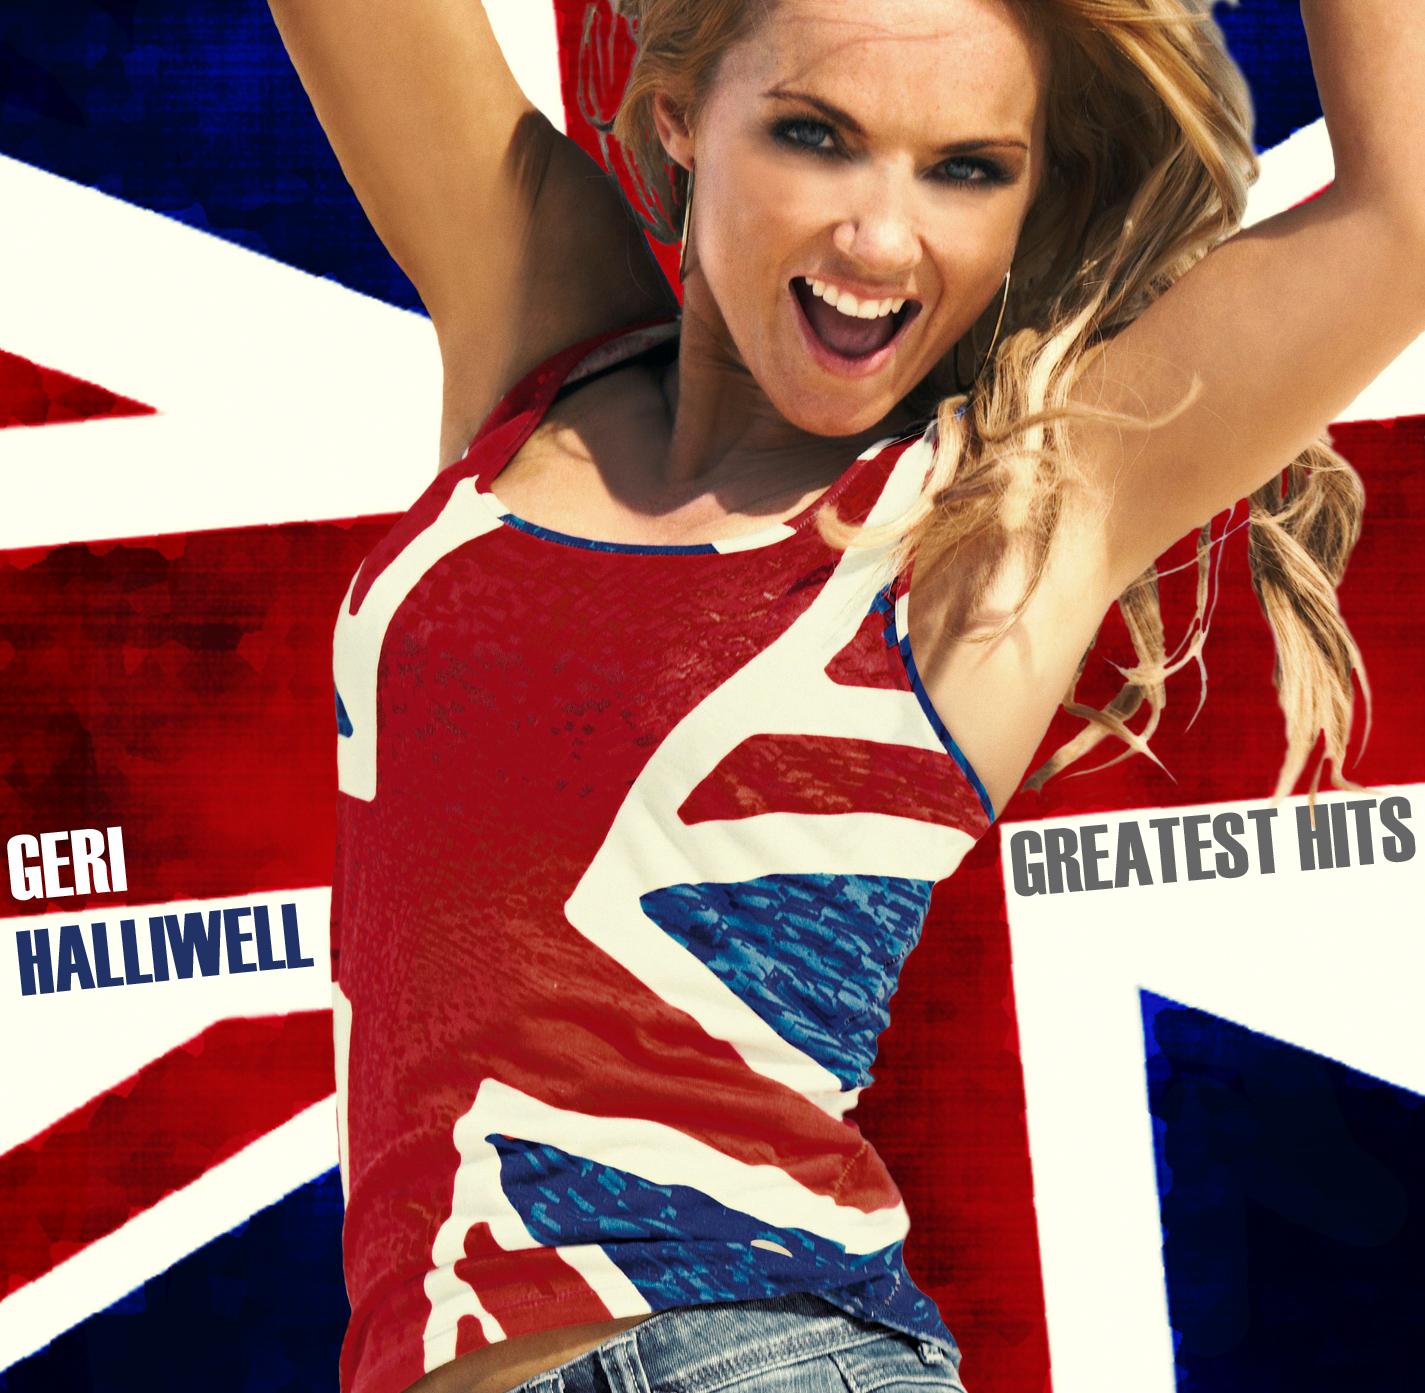 http://2.bp.blogspot.com/-AjCKkiQUR50/T5LlFFNRAfI/AAAAAAAAADA/2i1MA_FG-sI/s1600/Geri+Halliwell+-+Greatest+Hits+(Front).jpg